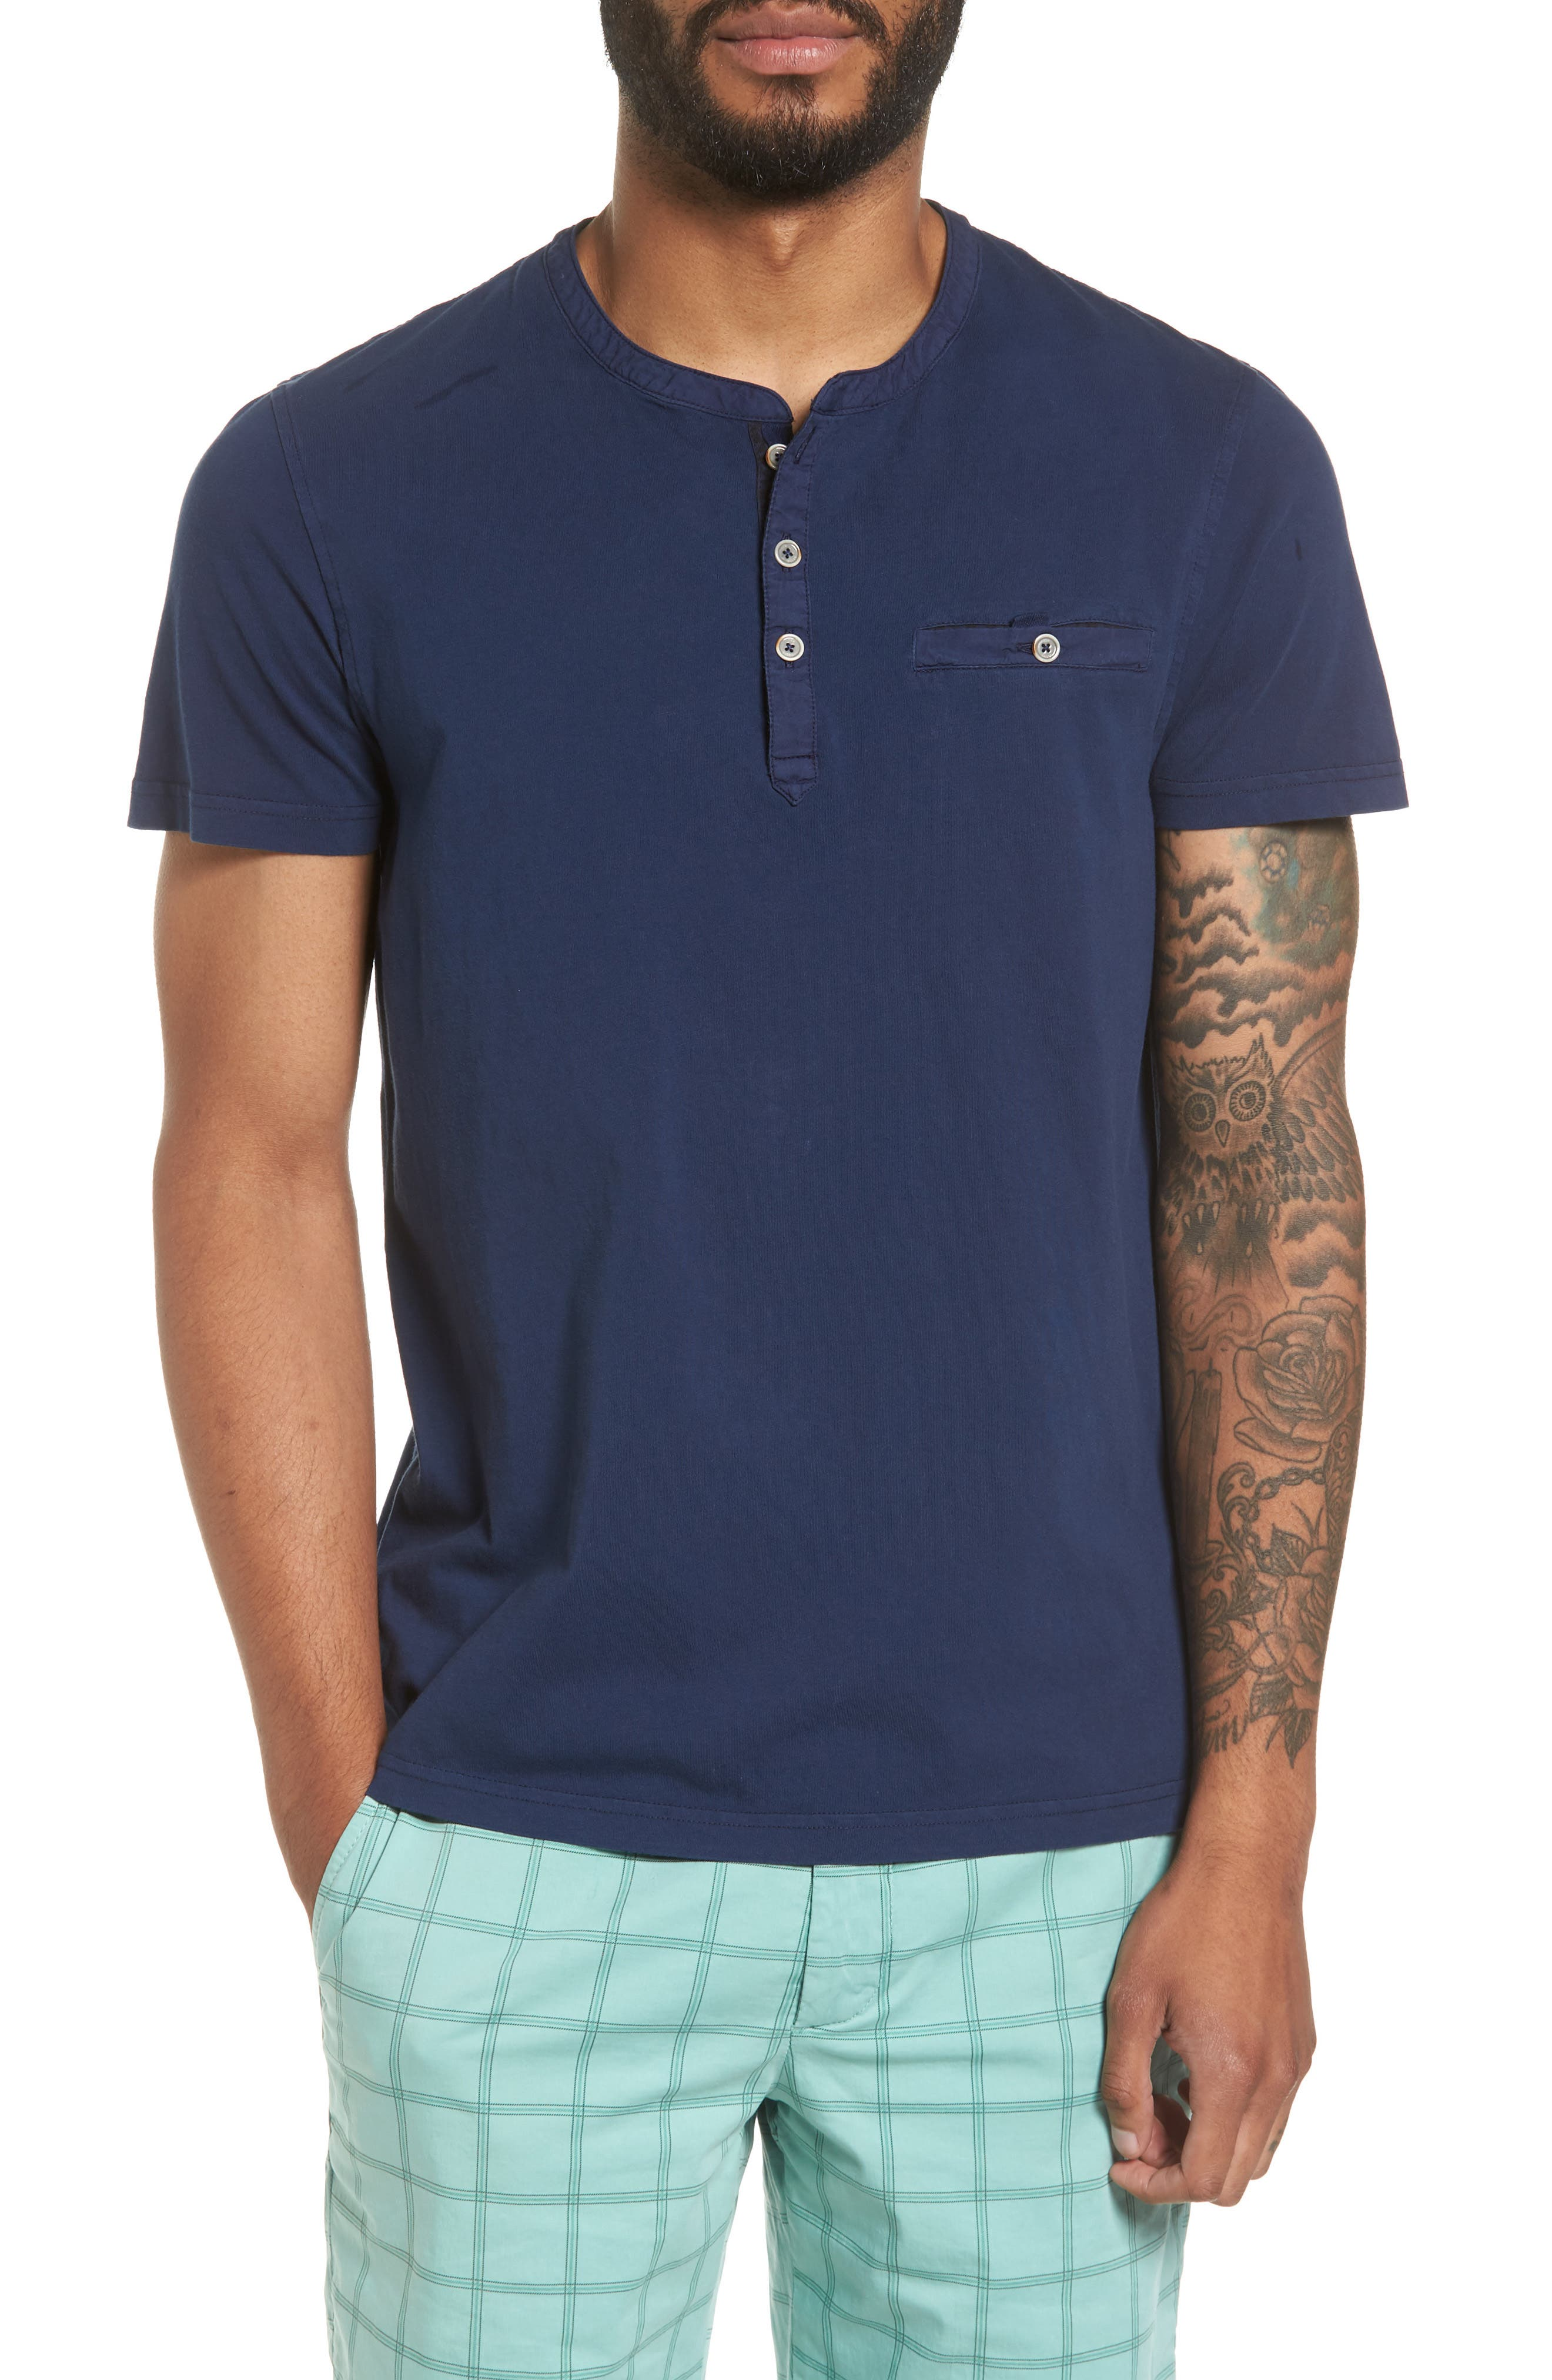 Ted Baker London Arrden Modern Slim Fit Short Sleeve Henley